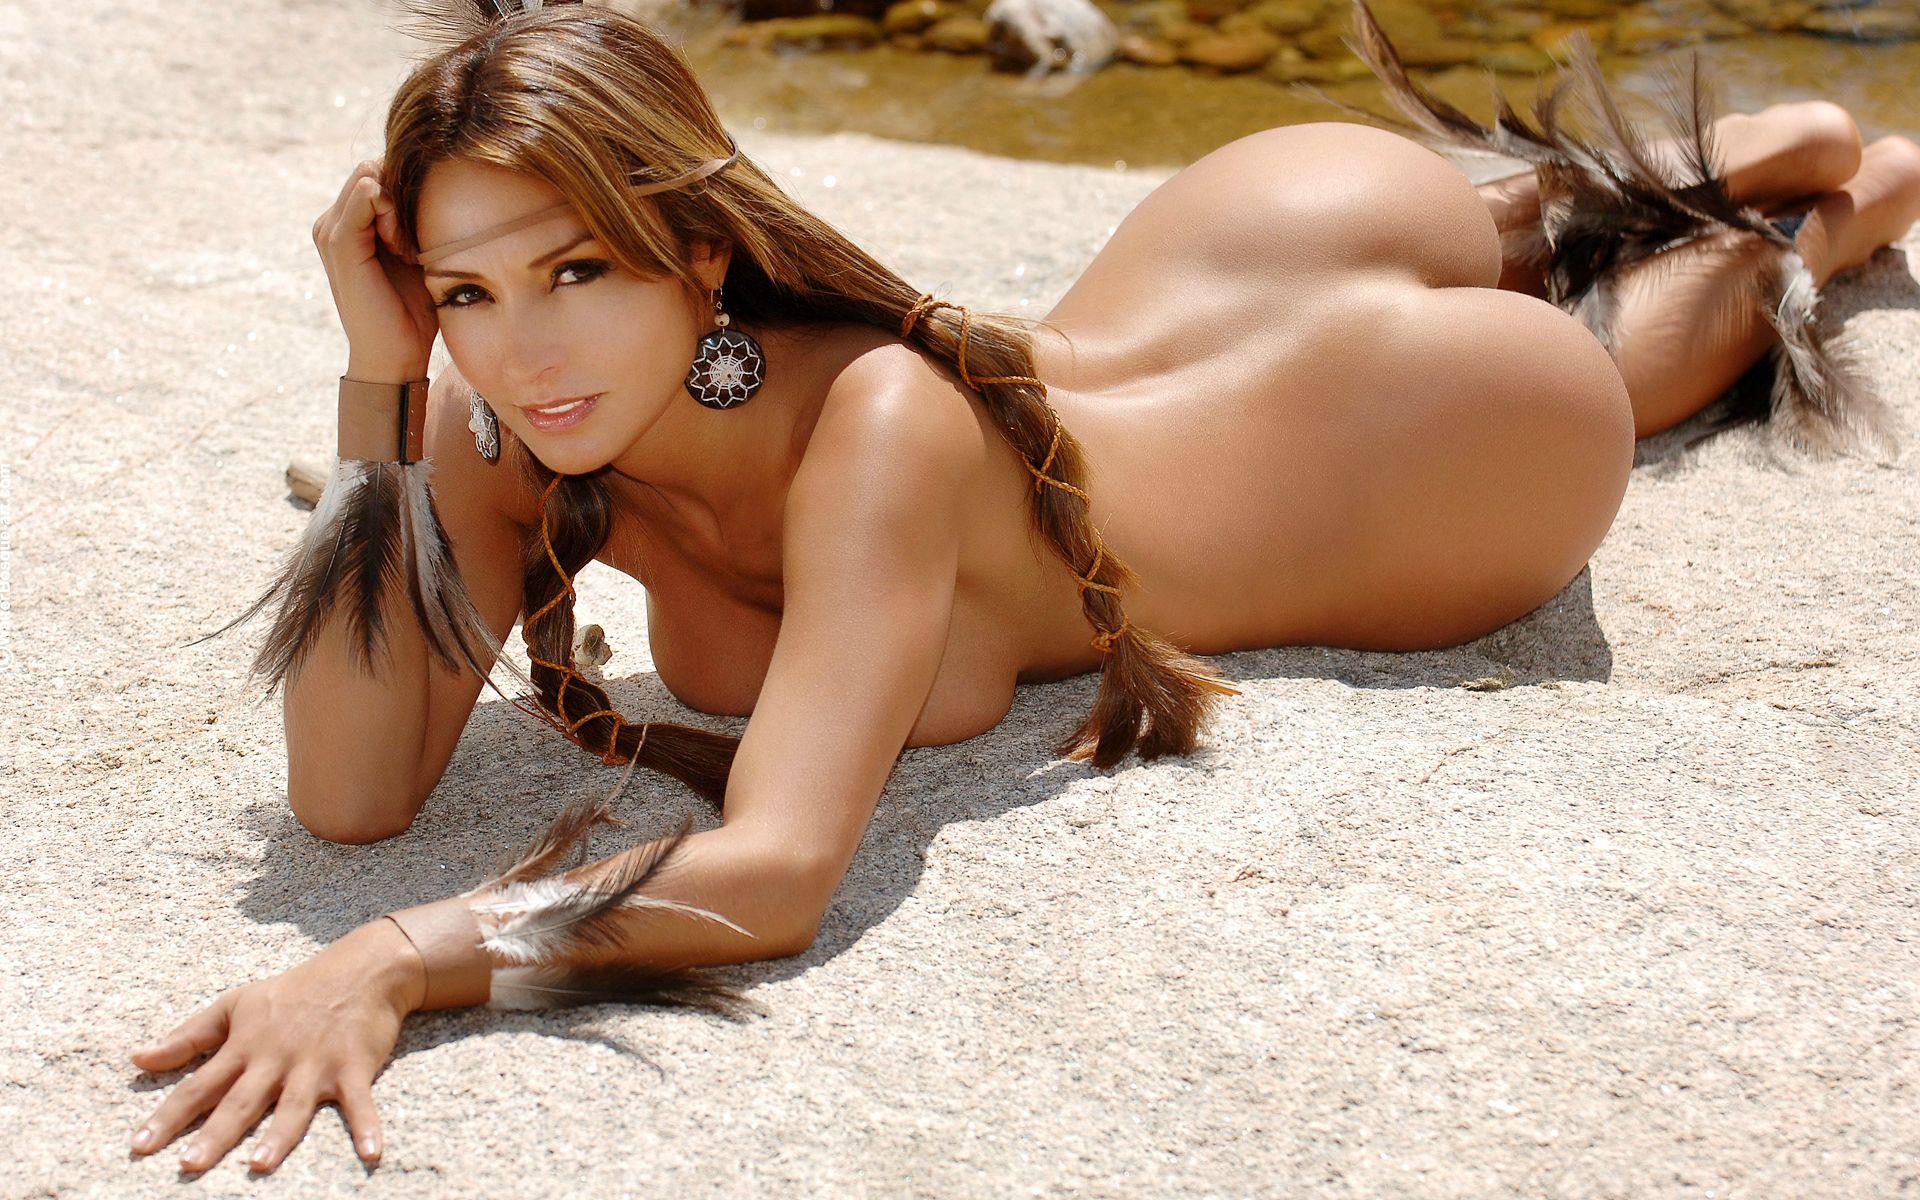 Indin women nakedphoto nudes lady